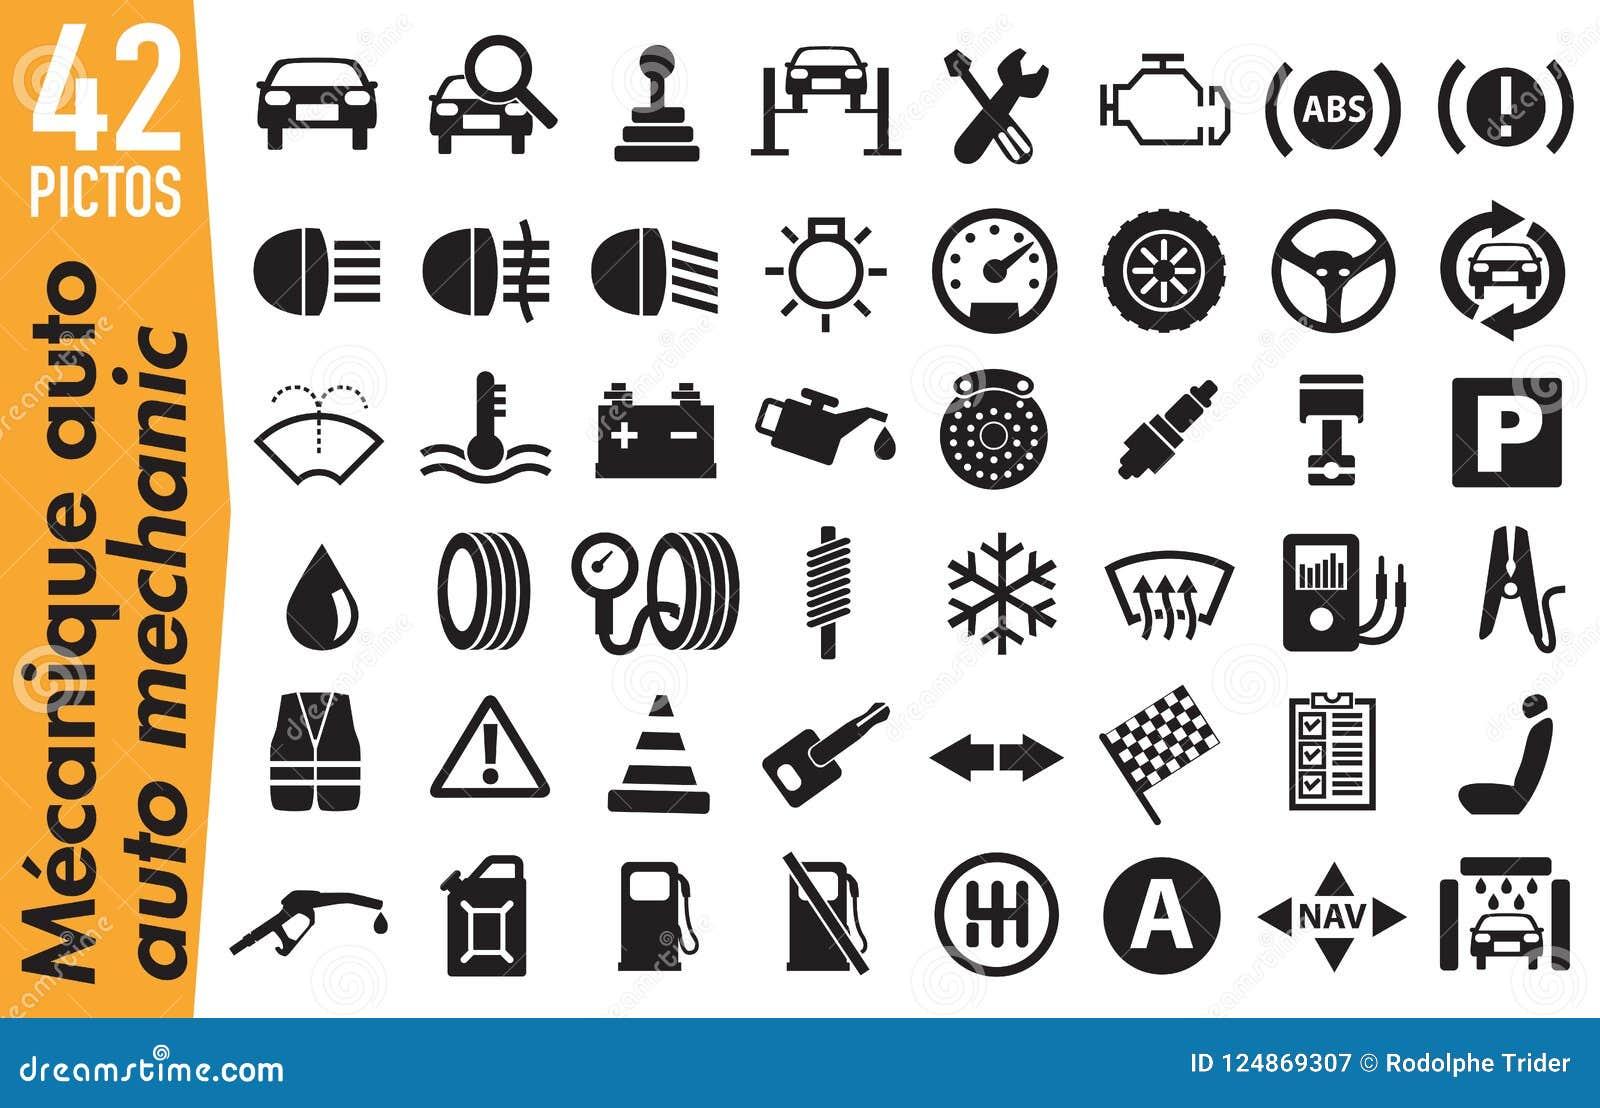 42 signage pictograms on automobile mechanics